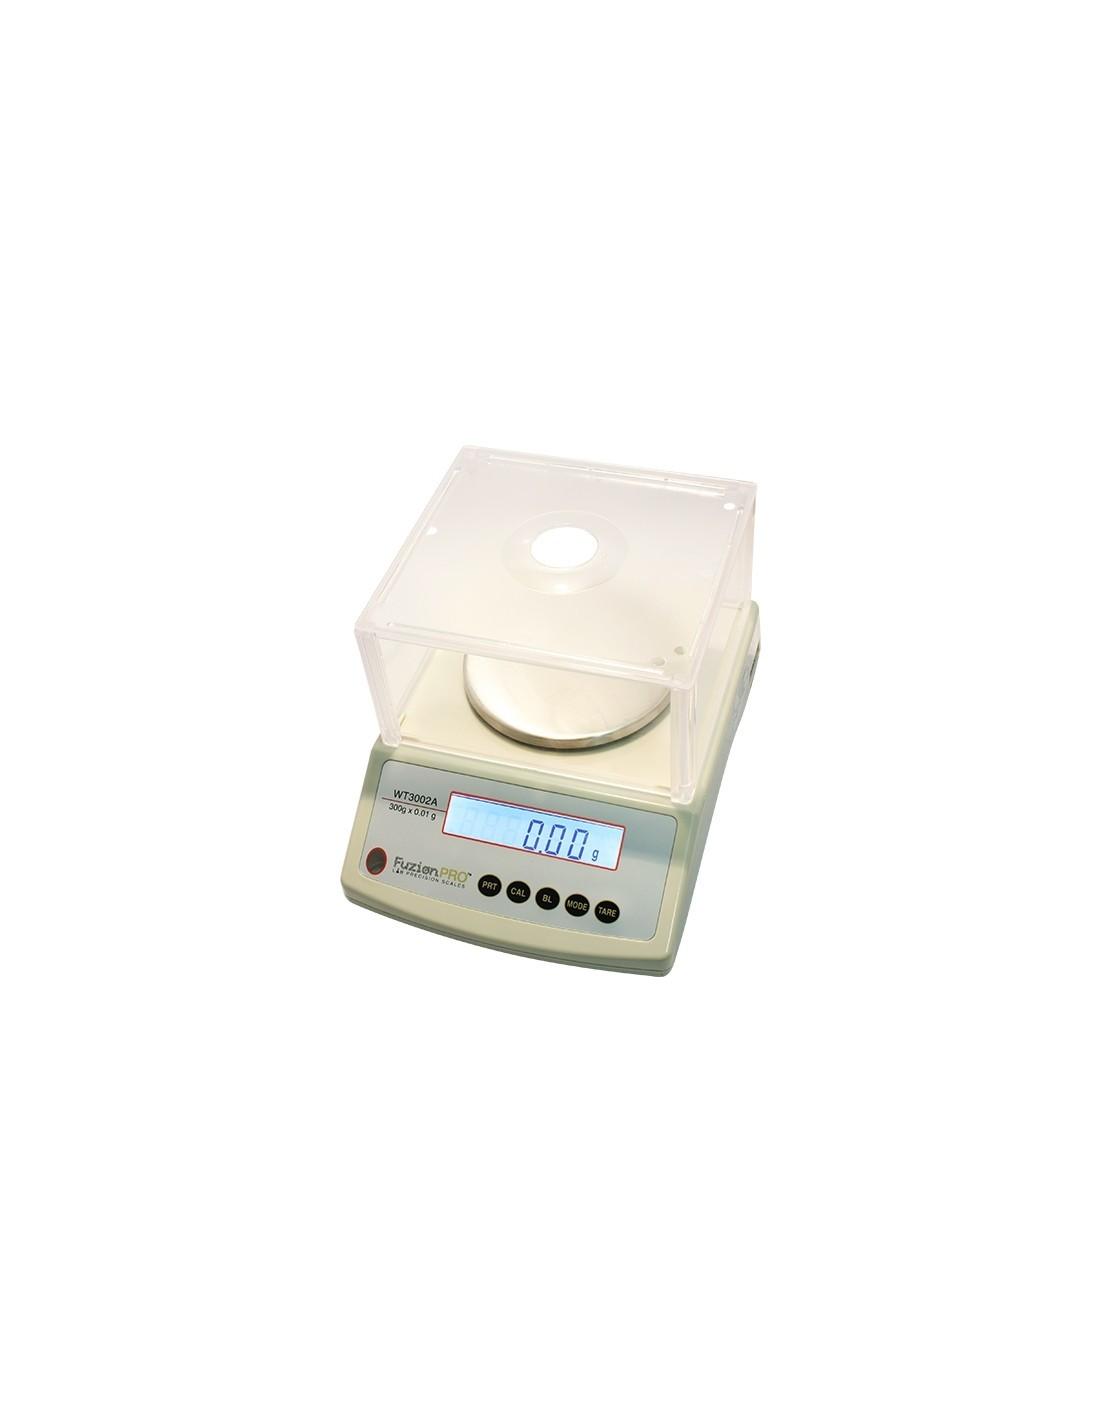 bascula-digital-precision-go-pro-300-0-01gr 3